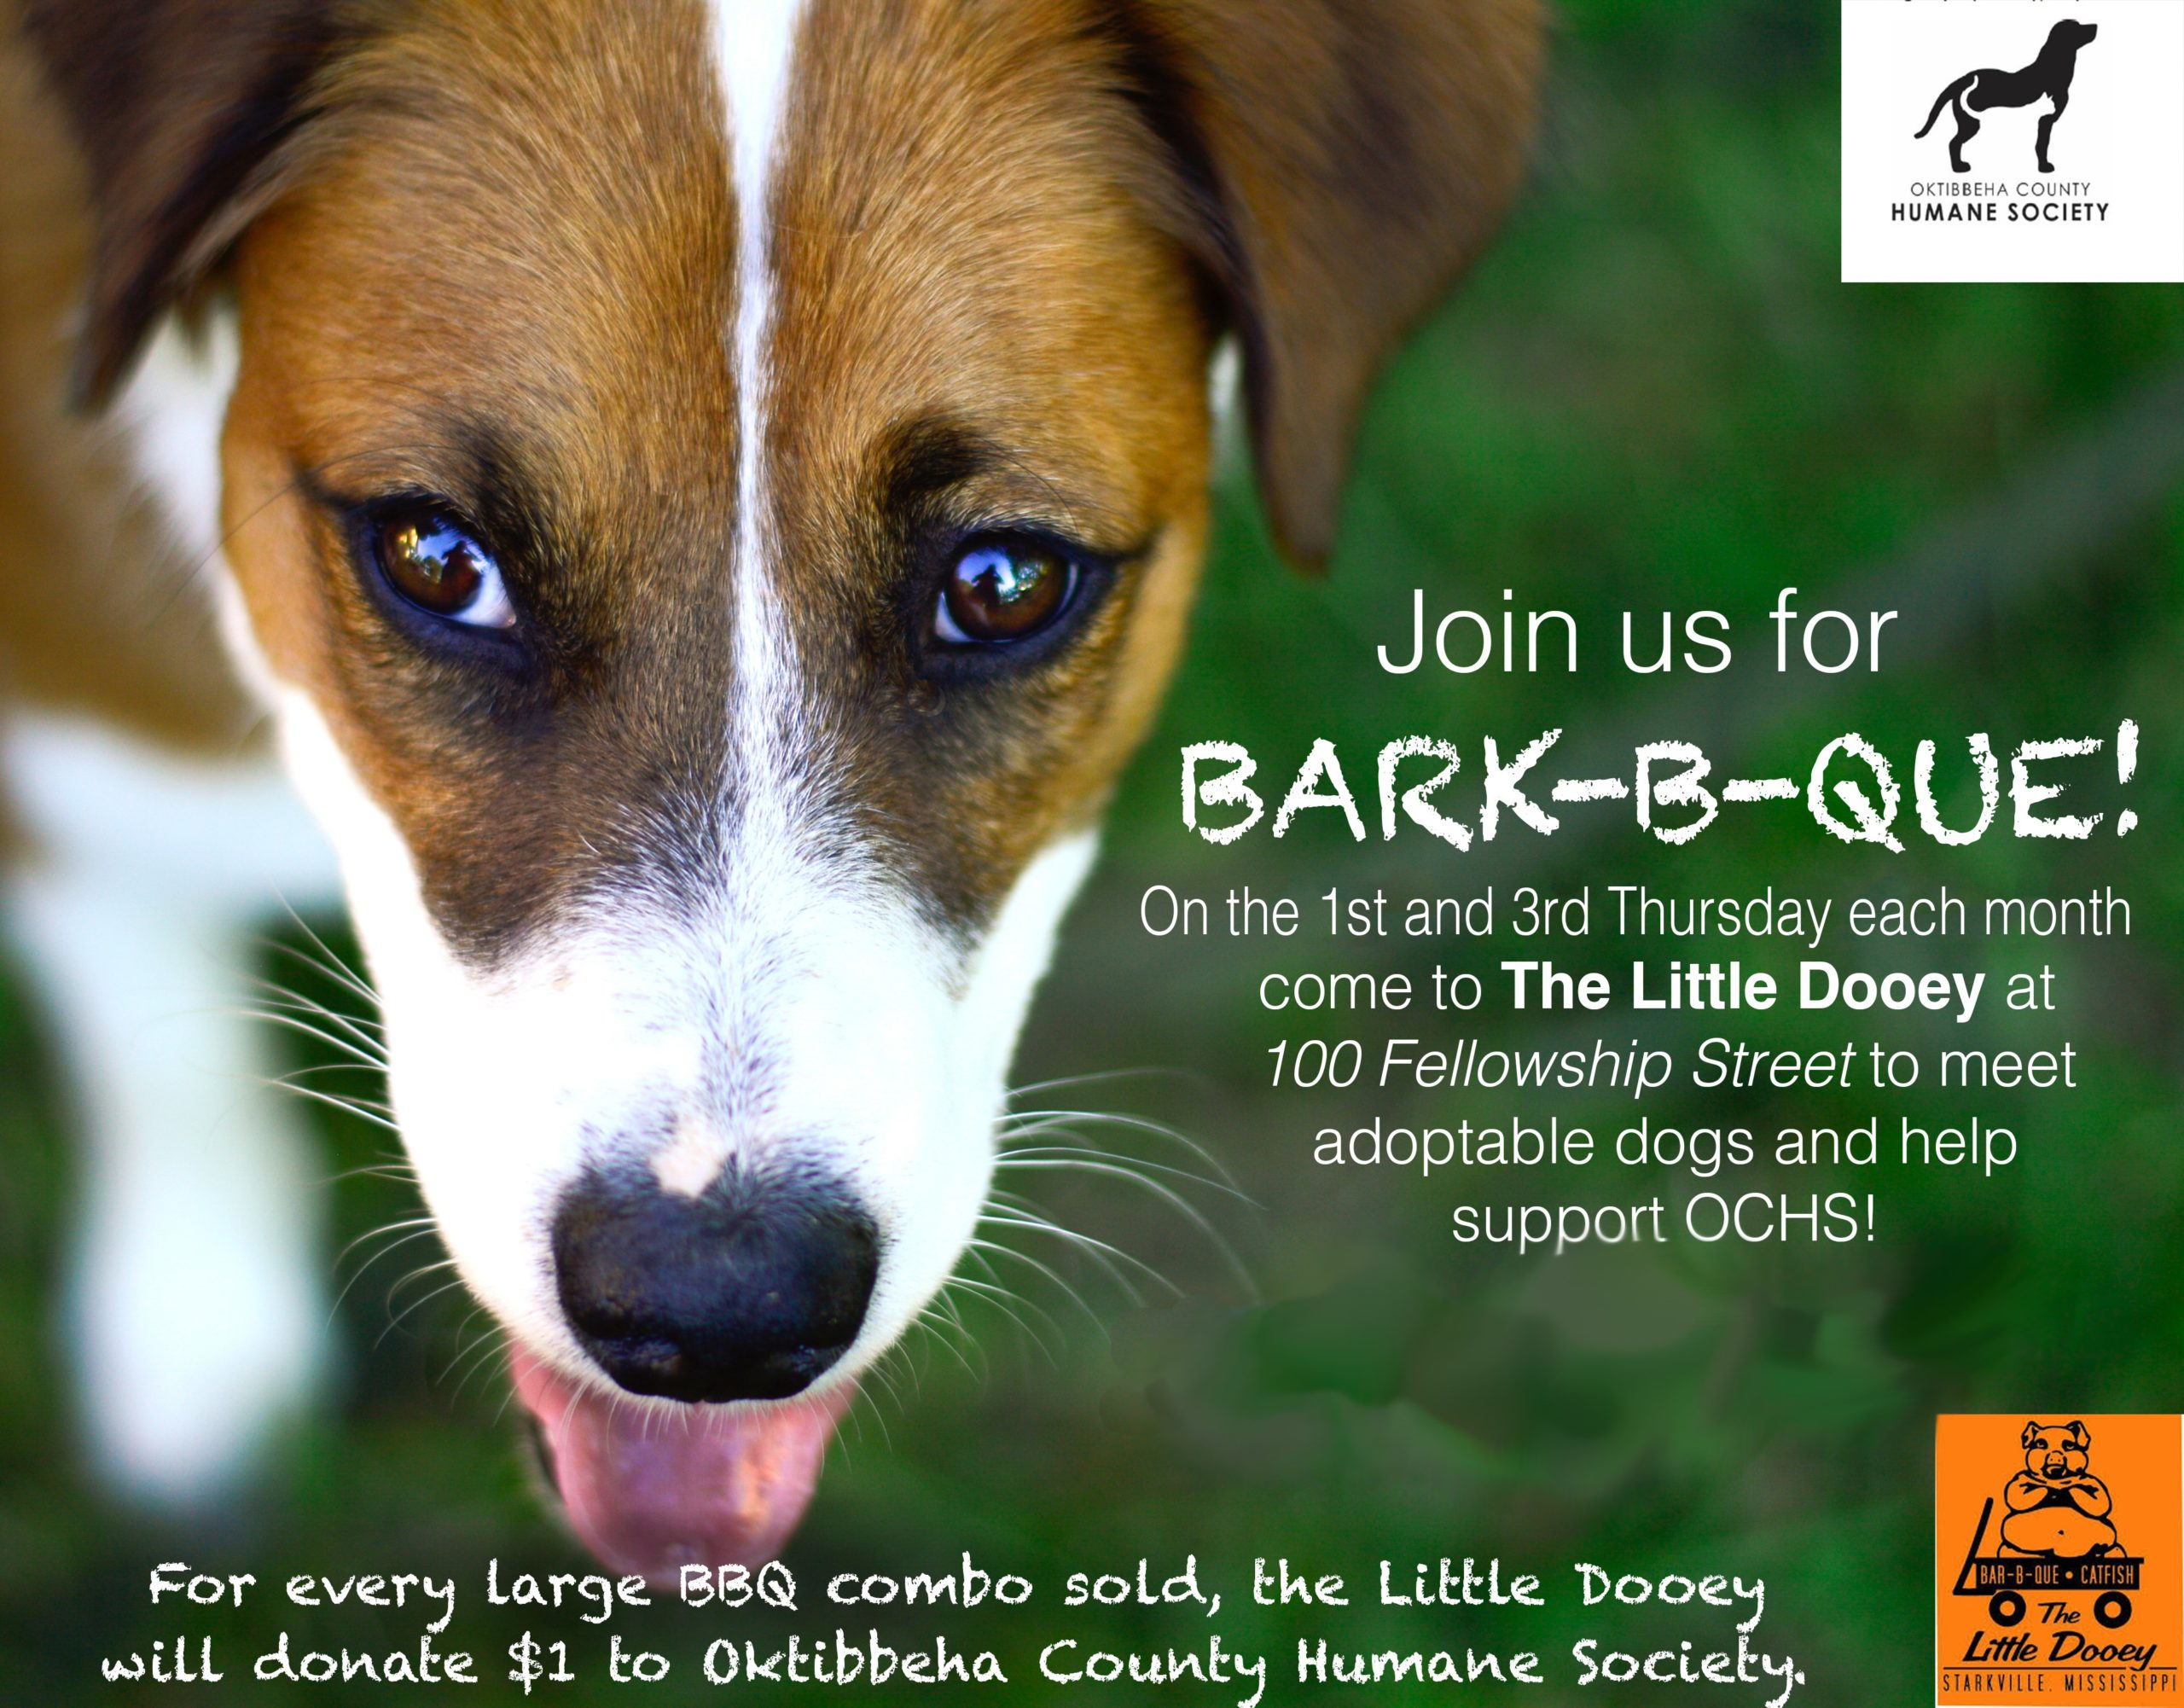 The Little Dooey's Bark-B-Que